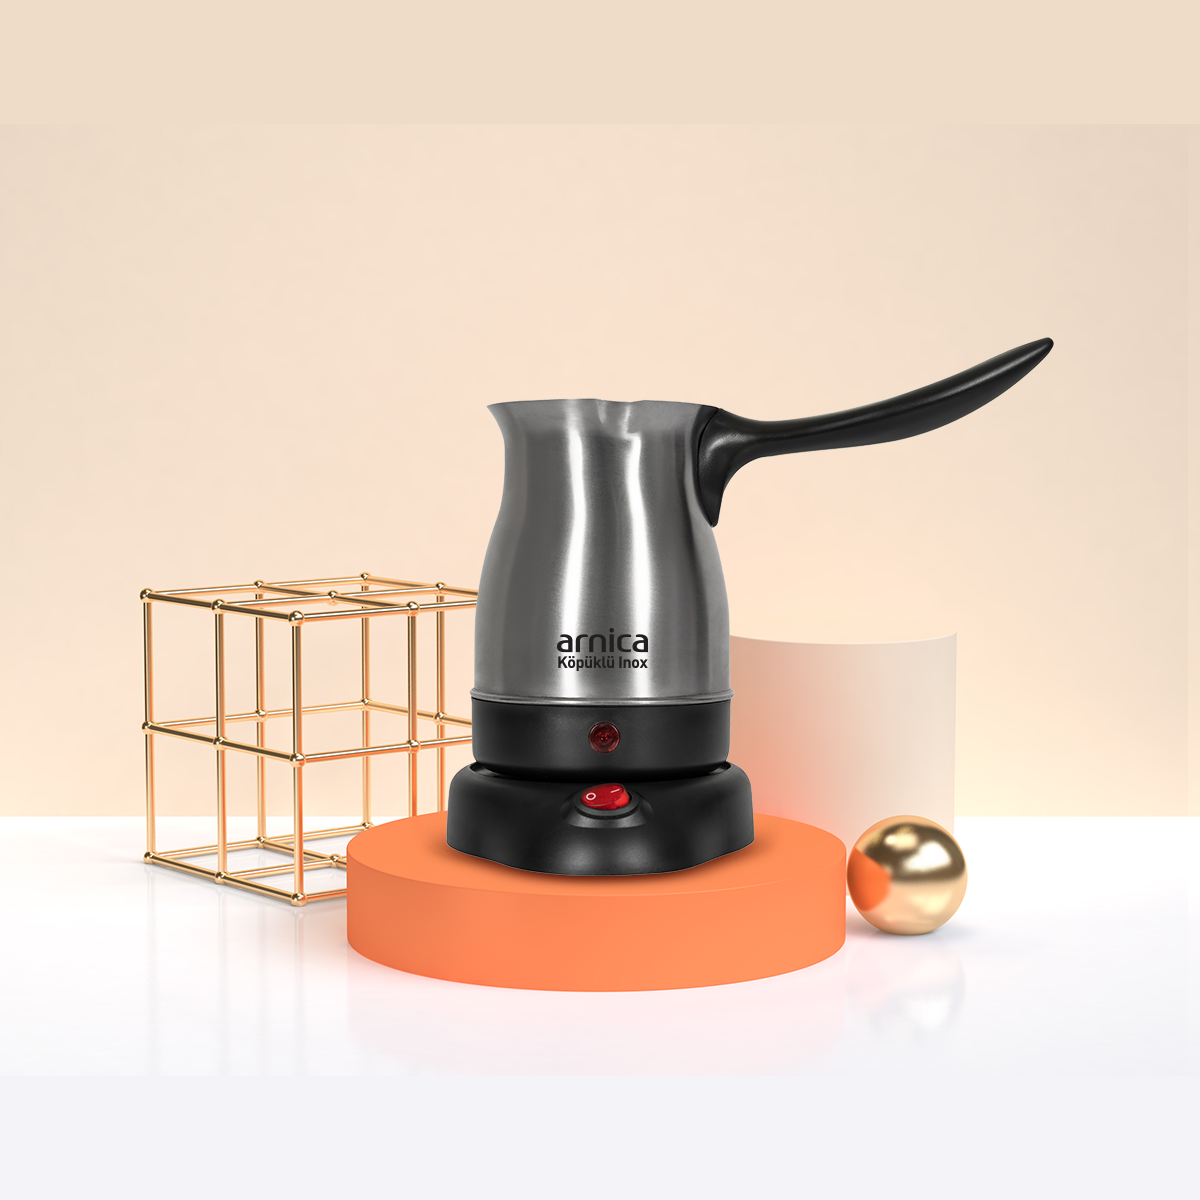 arnica kahve mak_1